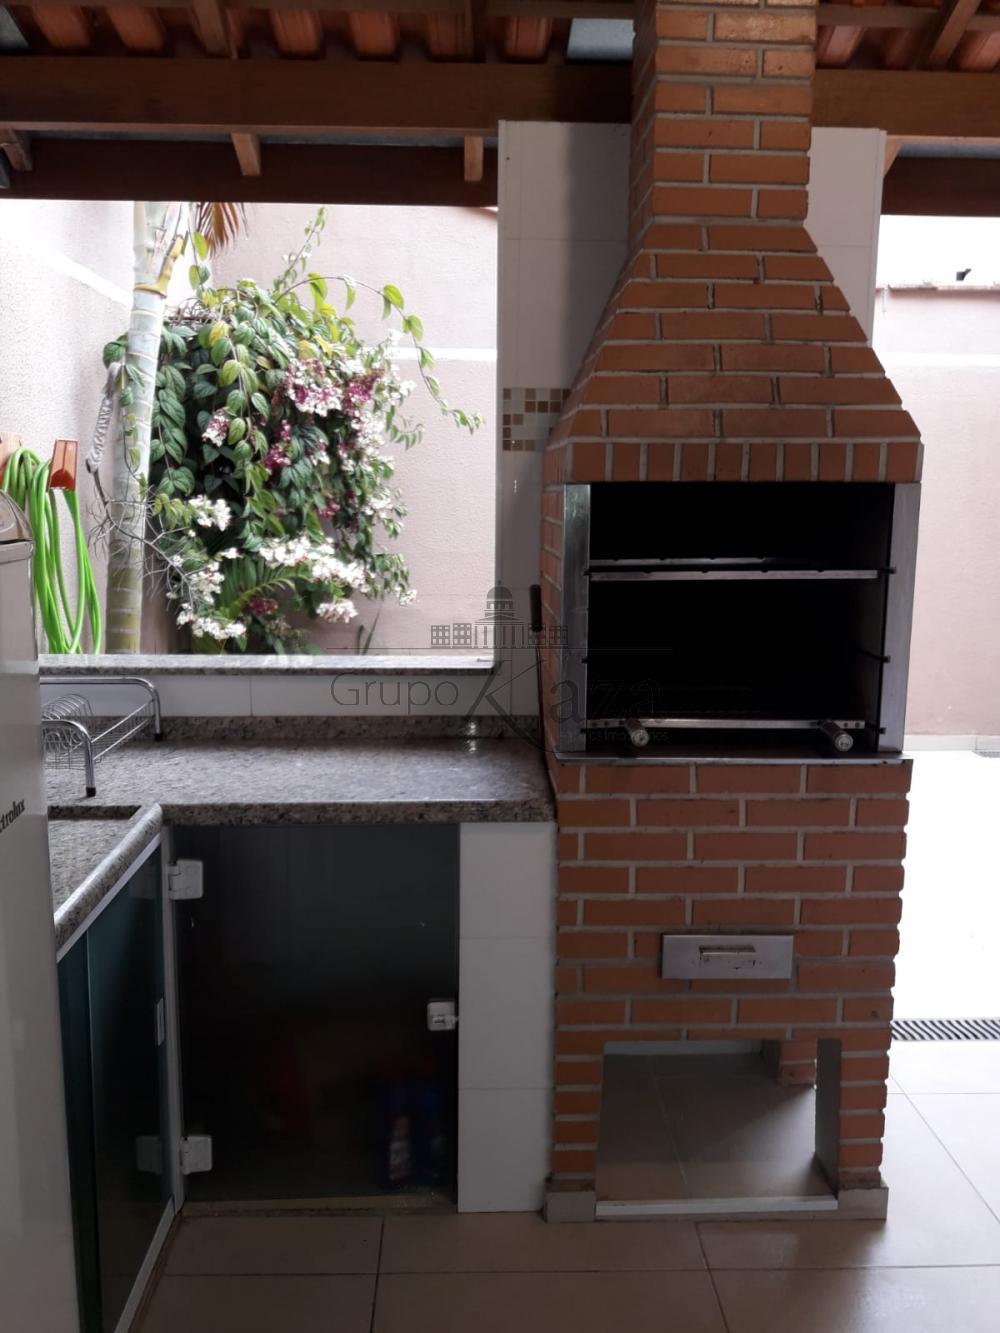 alt='Comprar Casa / Térrea em Jacareí R$ 375.000,00 - Foto 16' title='Comprar Casa / Térrea em Jacareí R$ 375.000,00 - Foto 16'